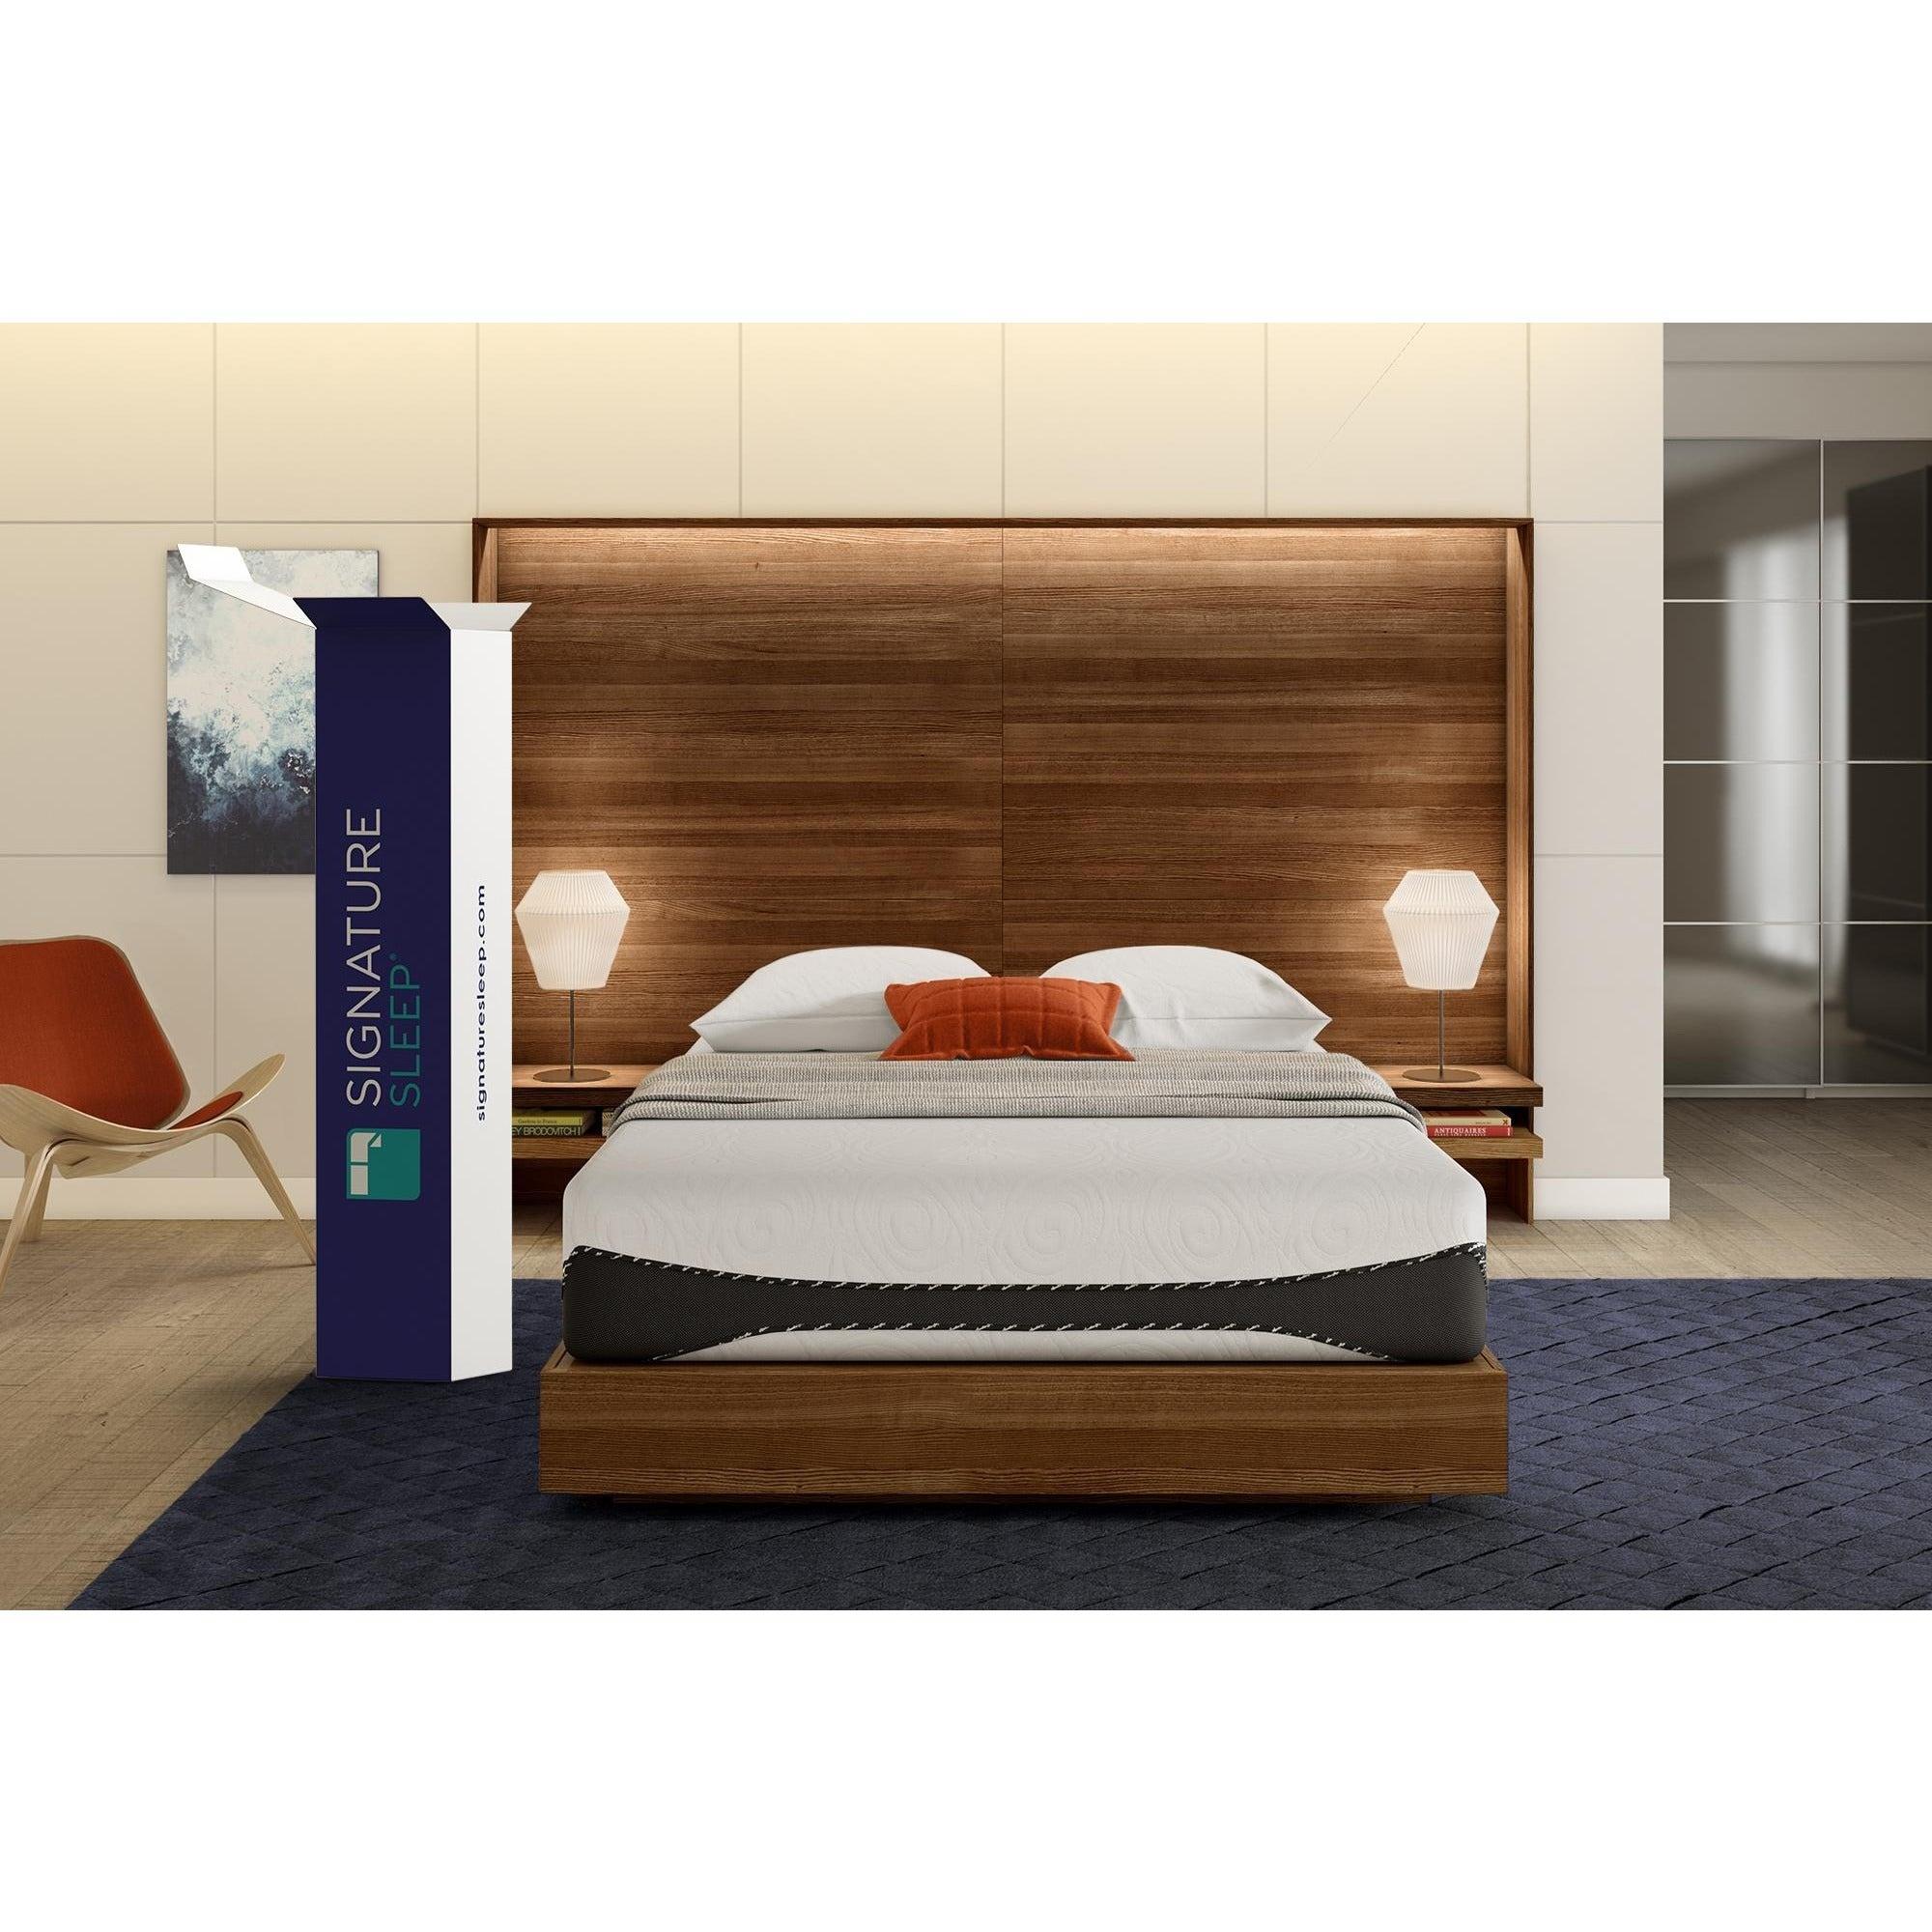 Shop Signature Sleep Bliss 12 Inch Luxury Gel Memory Foam Mattress